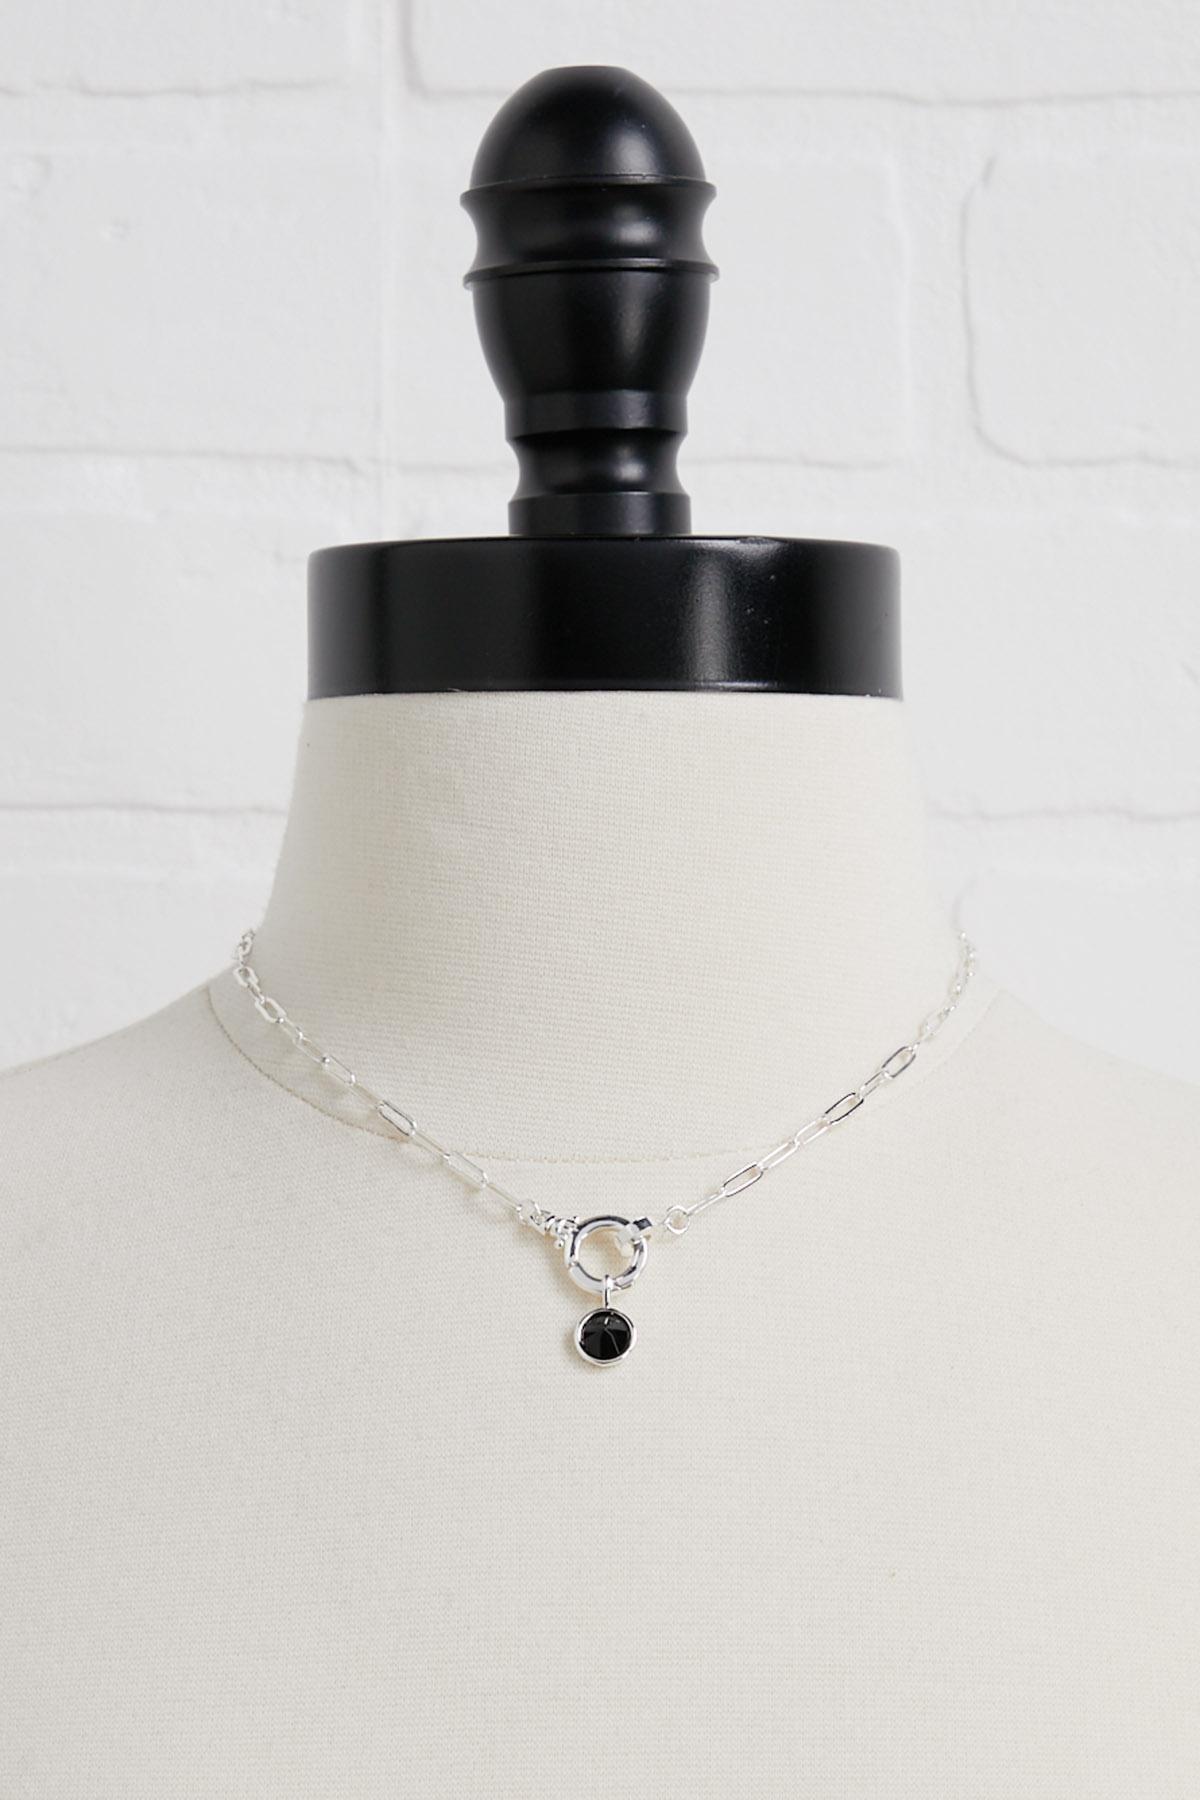 Black Stone Sterling Silver Charm